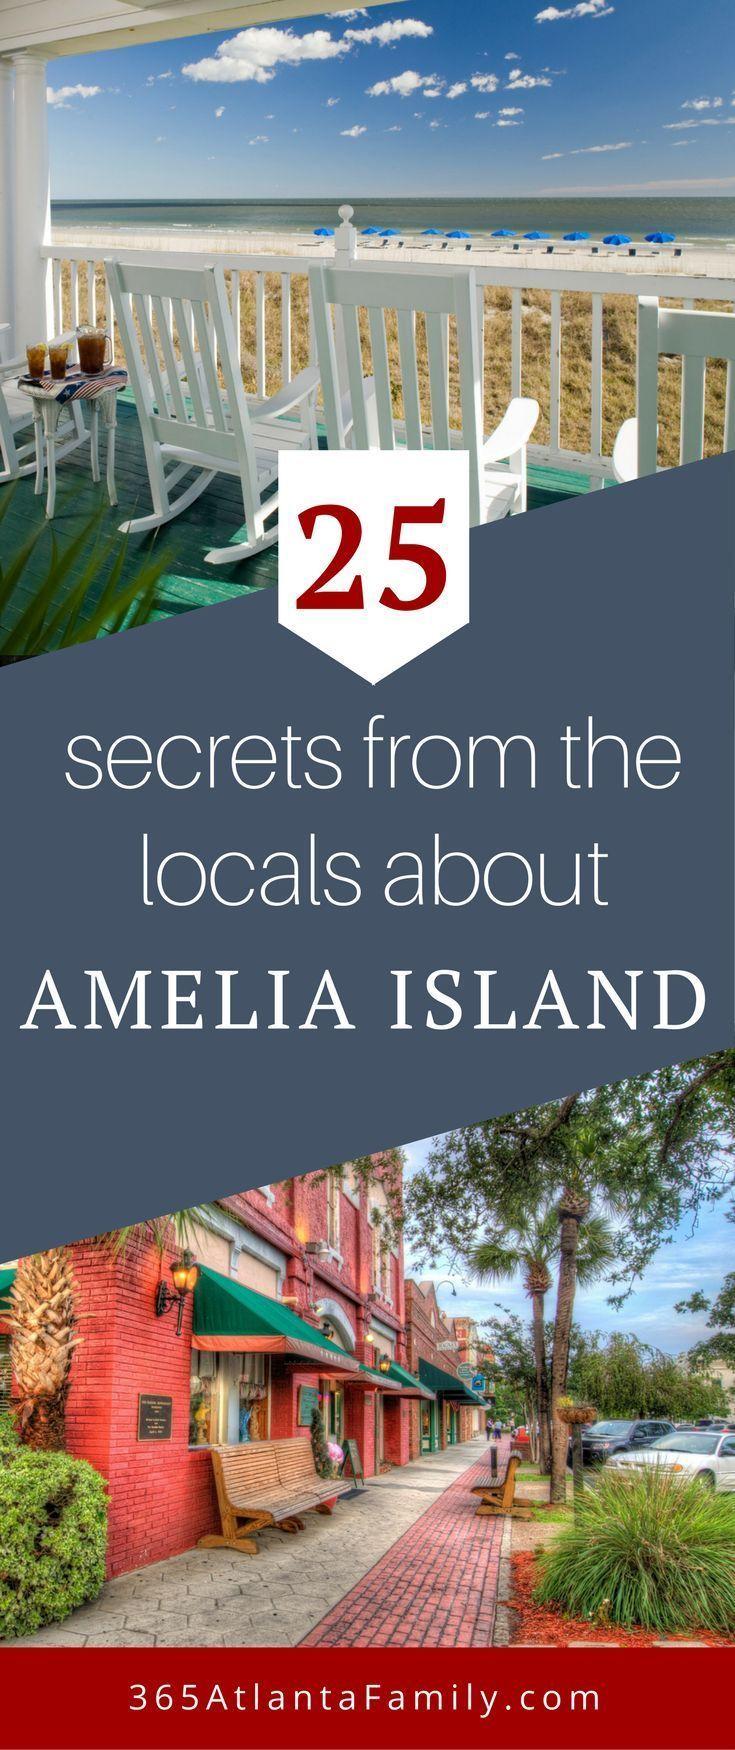 29 Things To Do In Amelia Island That The Locals Want Kept Secret Amelia Island Florida Island Vacation Amelia Island